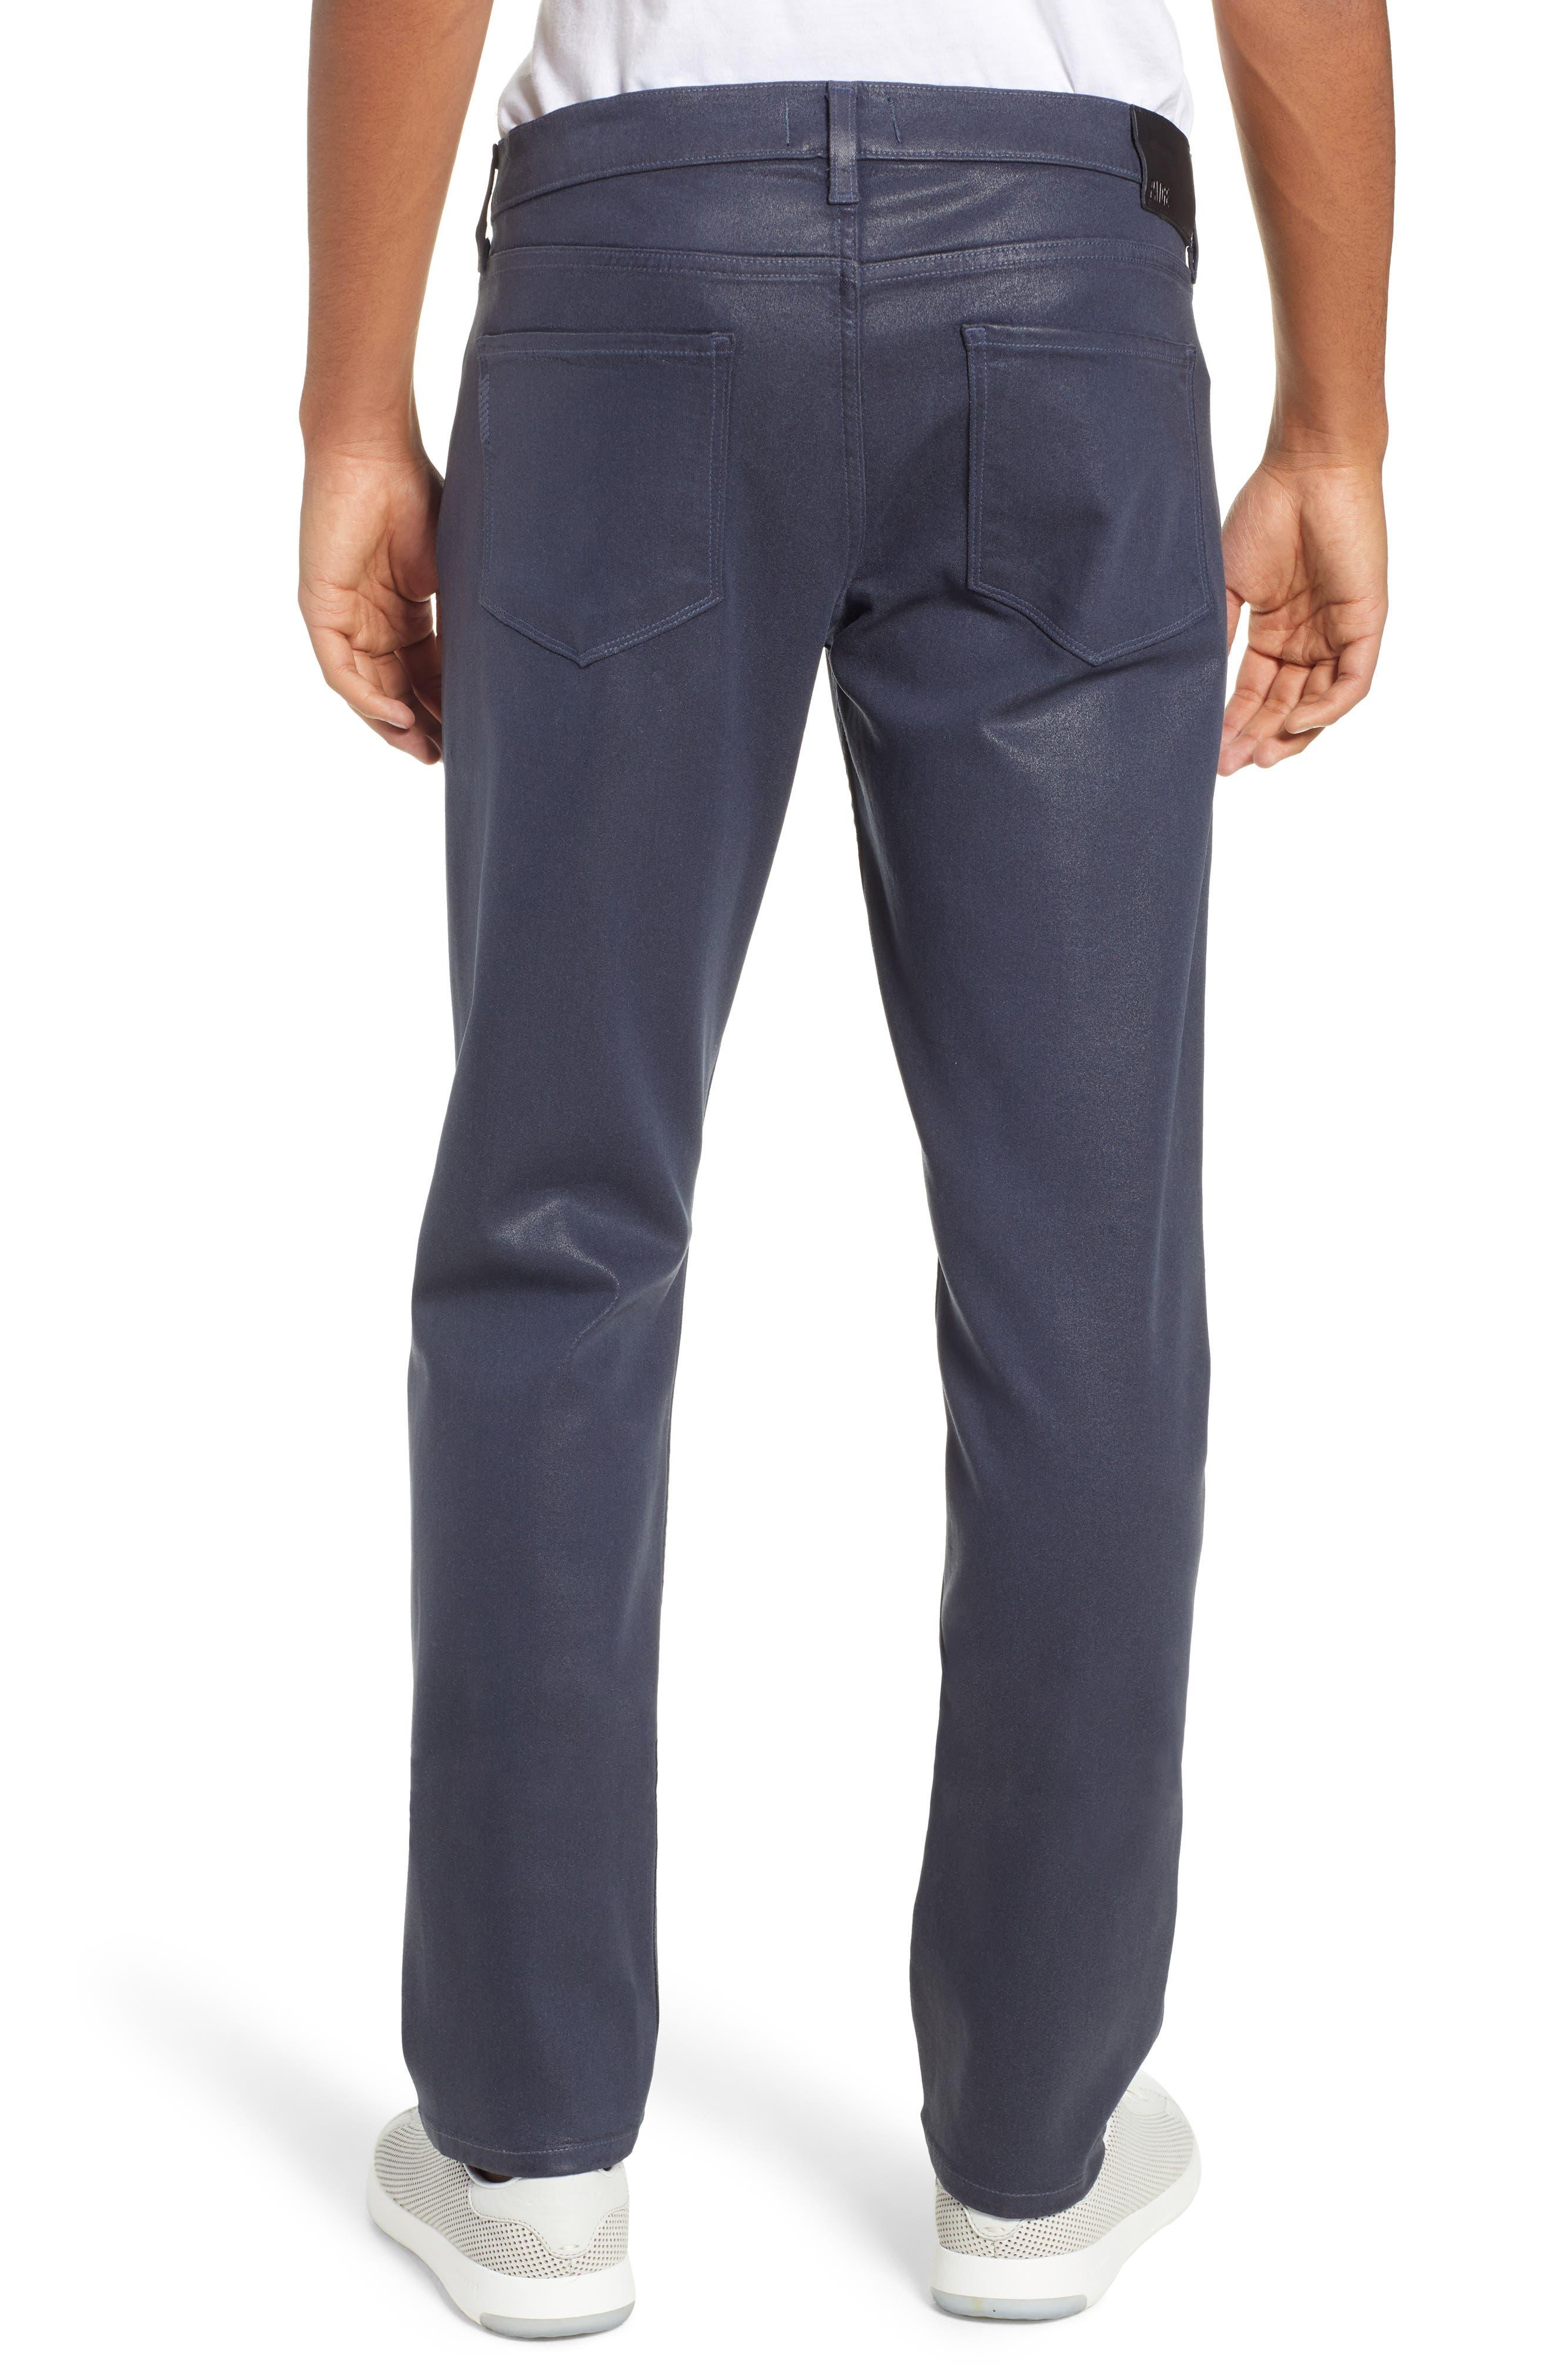 Transcend - Lennox Slim Fit Jeans,                             Alternate thumbnail 2, color,                             NIGHTFALL COATED